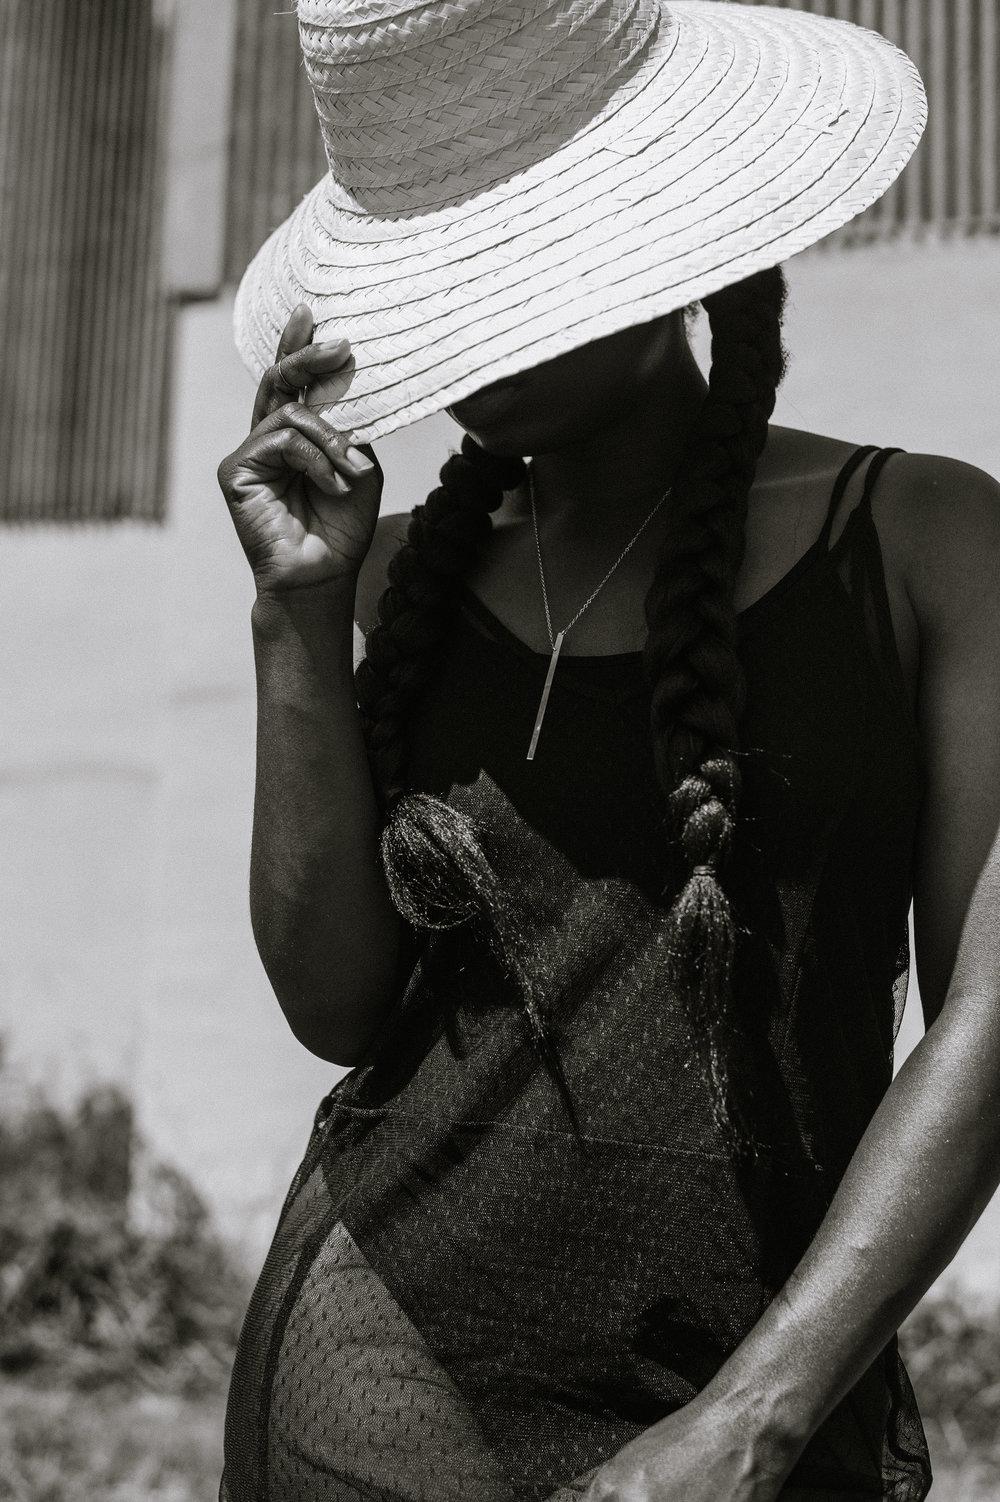 Tasha-James-The-Glossier-Blogger-Fashion-Style-HM-Lace-Dress-Black-8.jpg